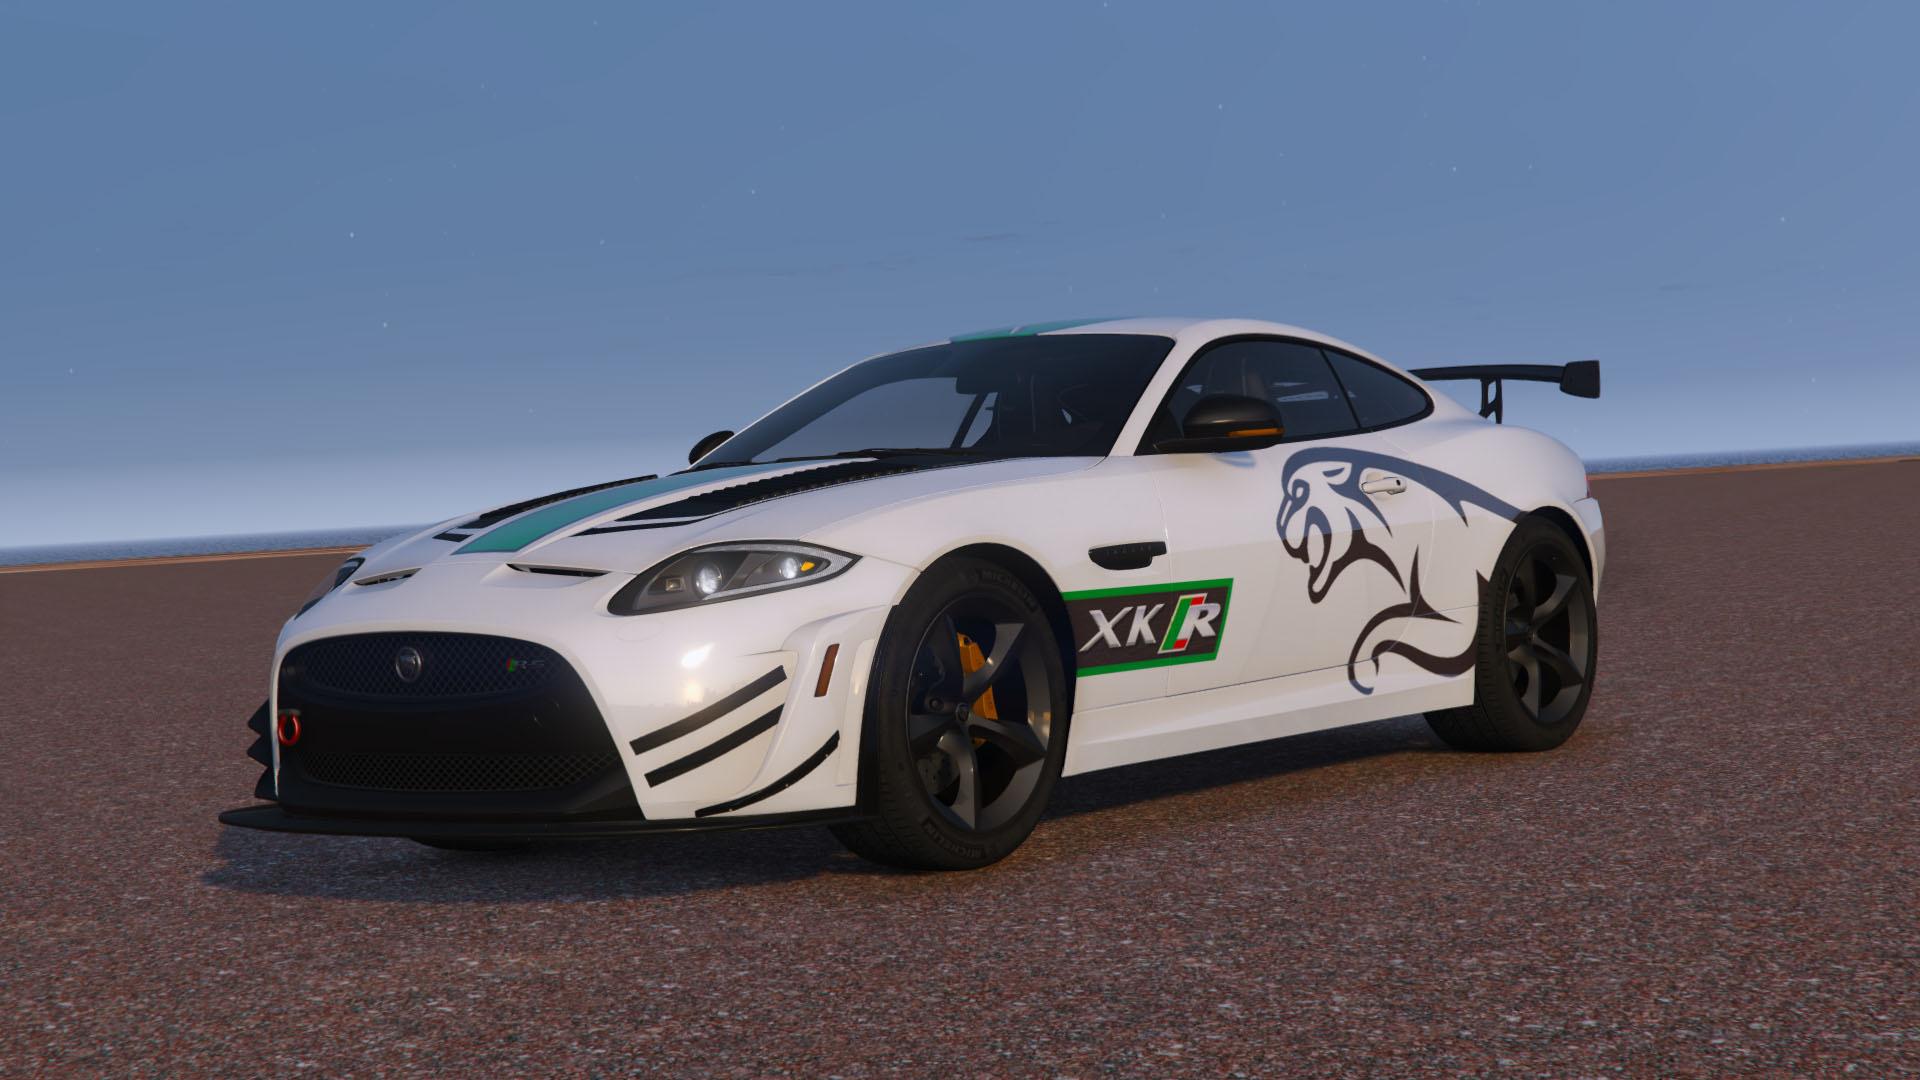 2015 Jaguar XKR-S GT livery - GTA5-Mods.com